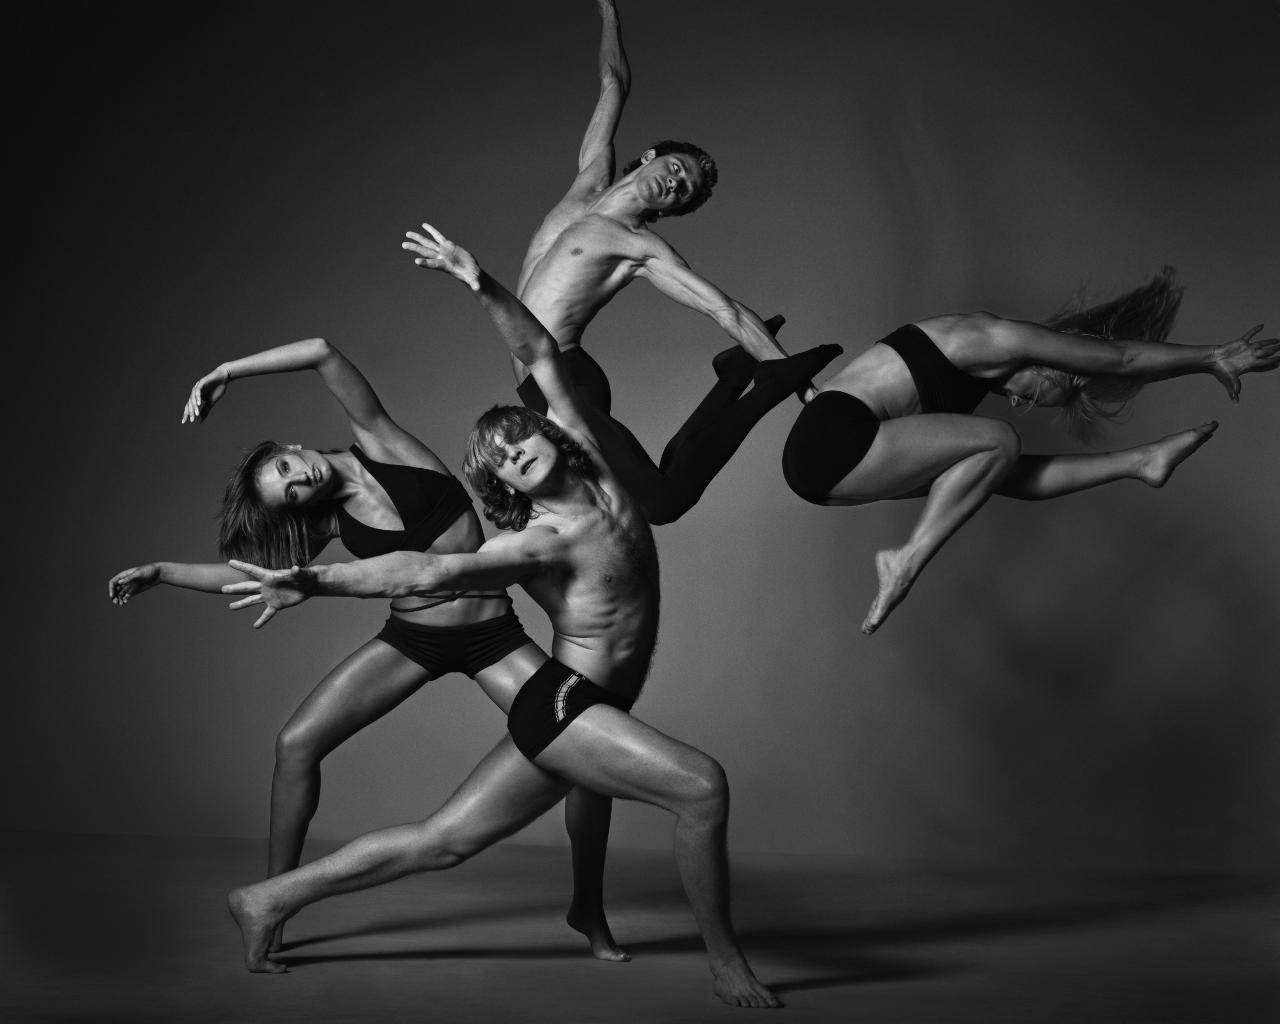 Desiree Huffman dance background 1280x1024